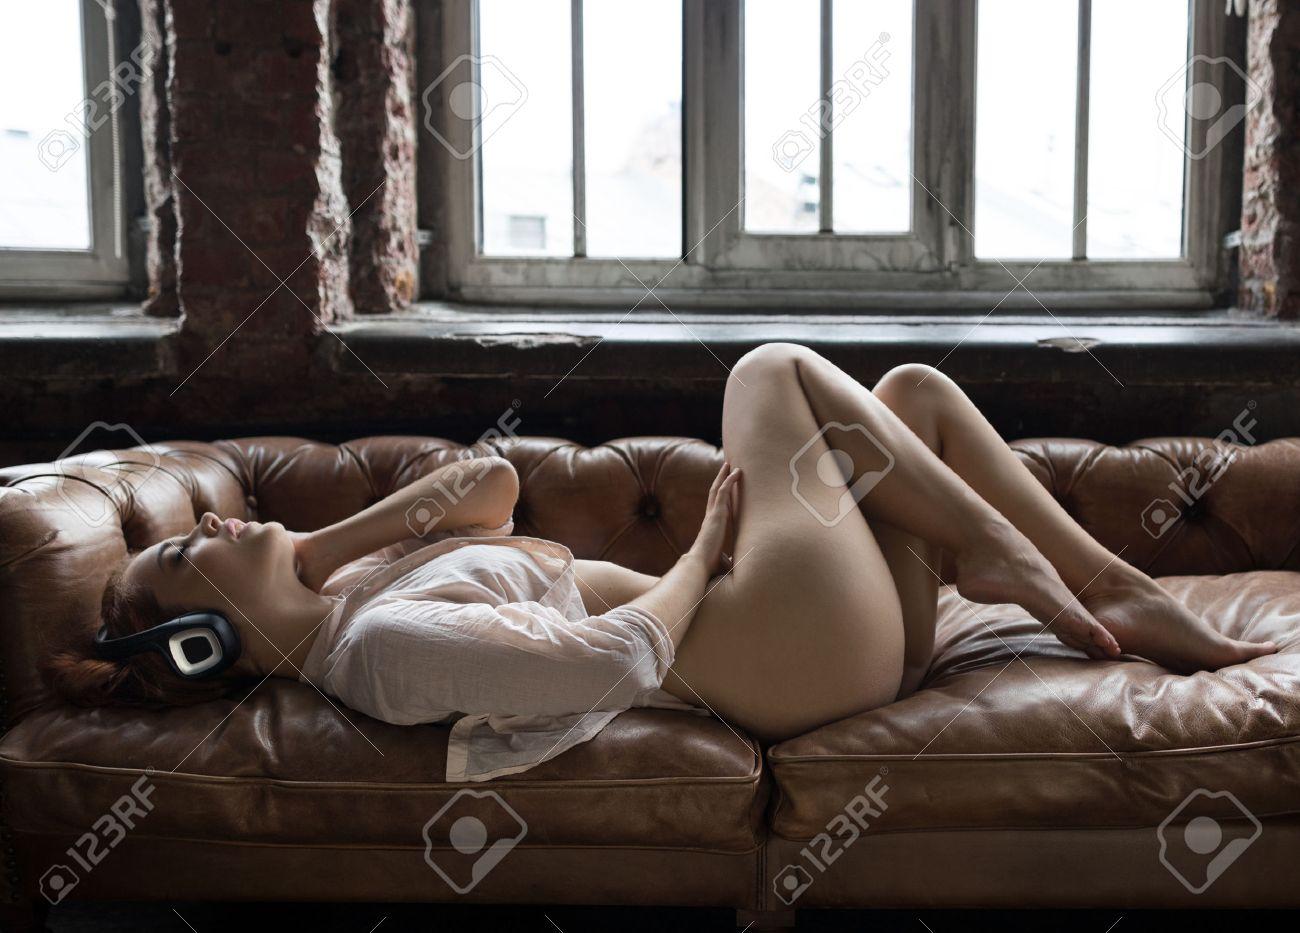 babes-lying-around-naked-gyrls